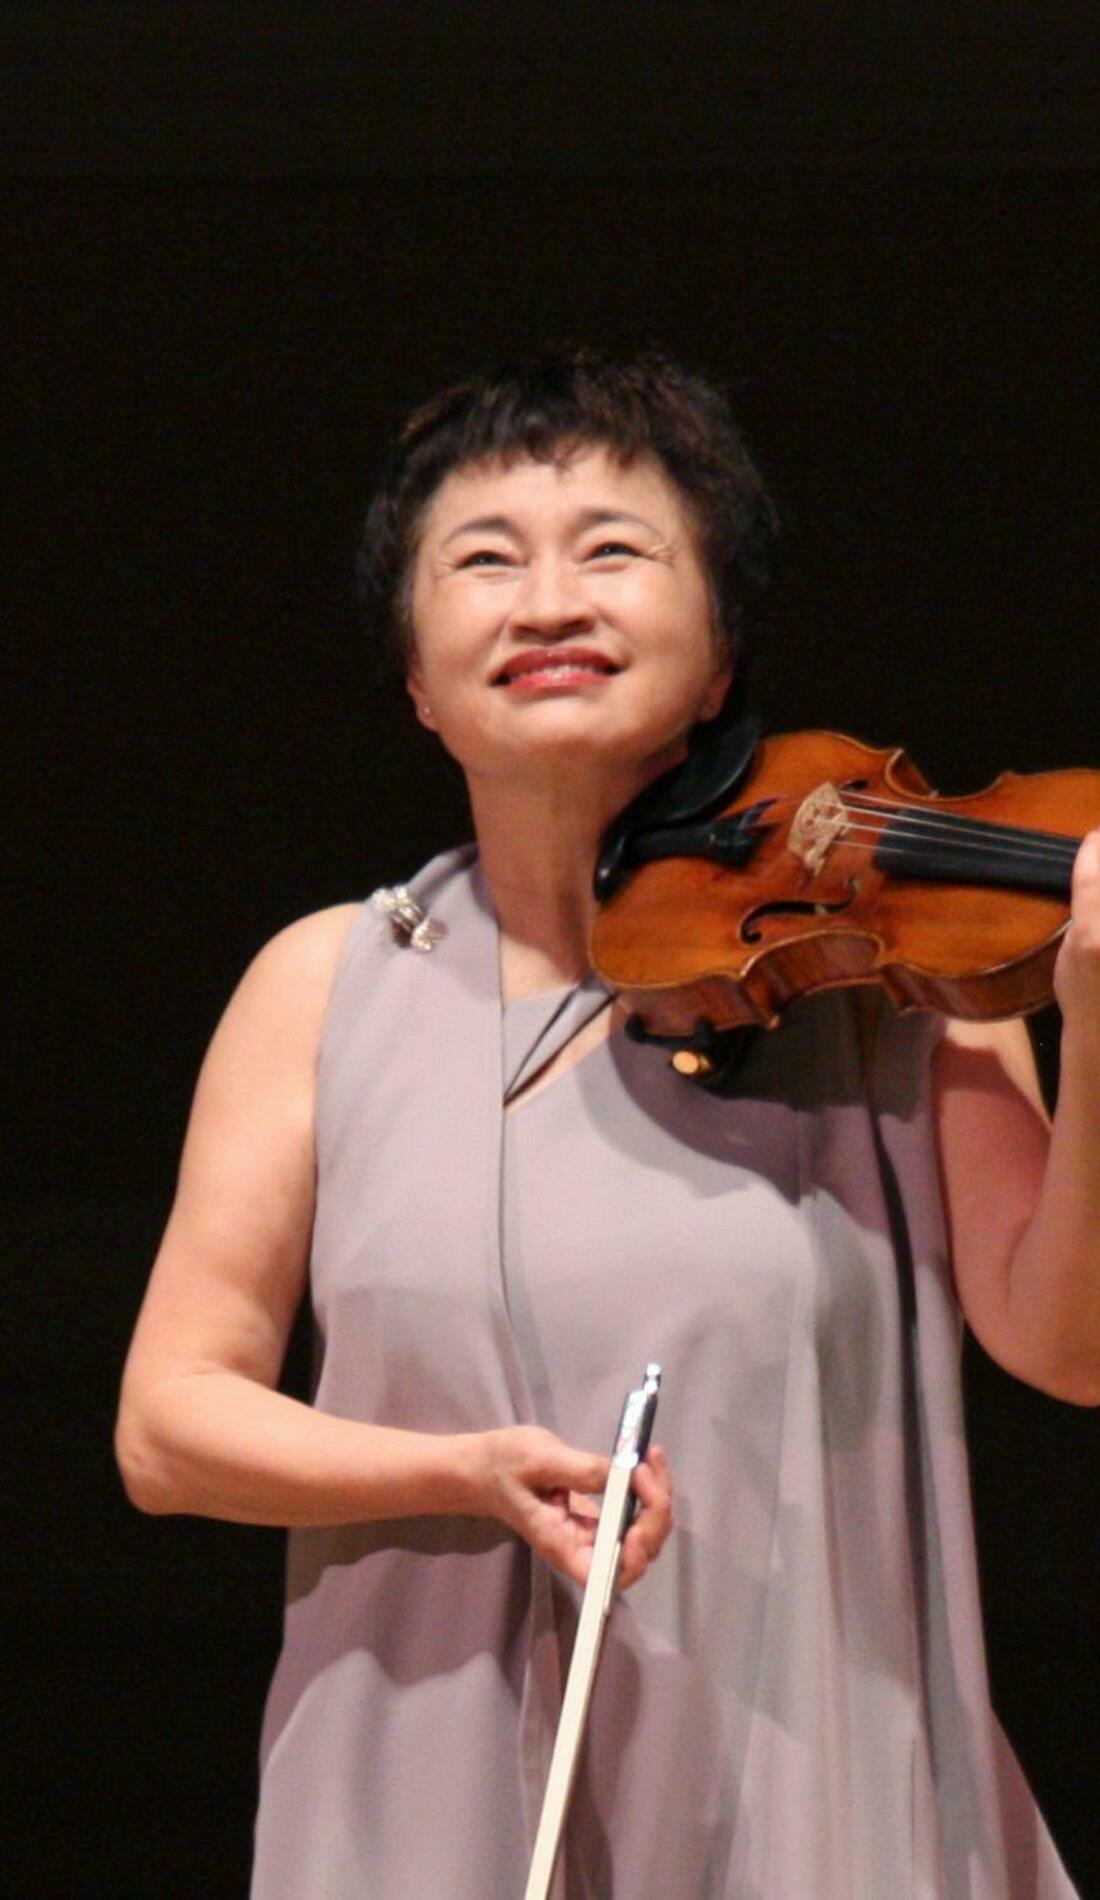 A Kyung Wha Chung live event